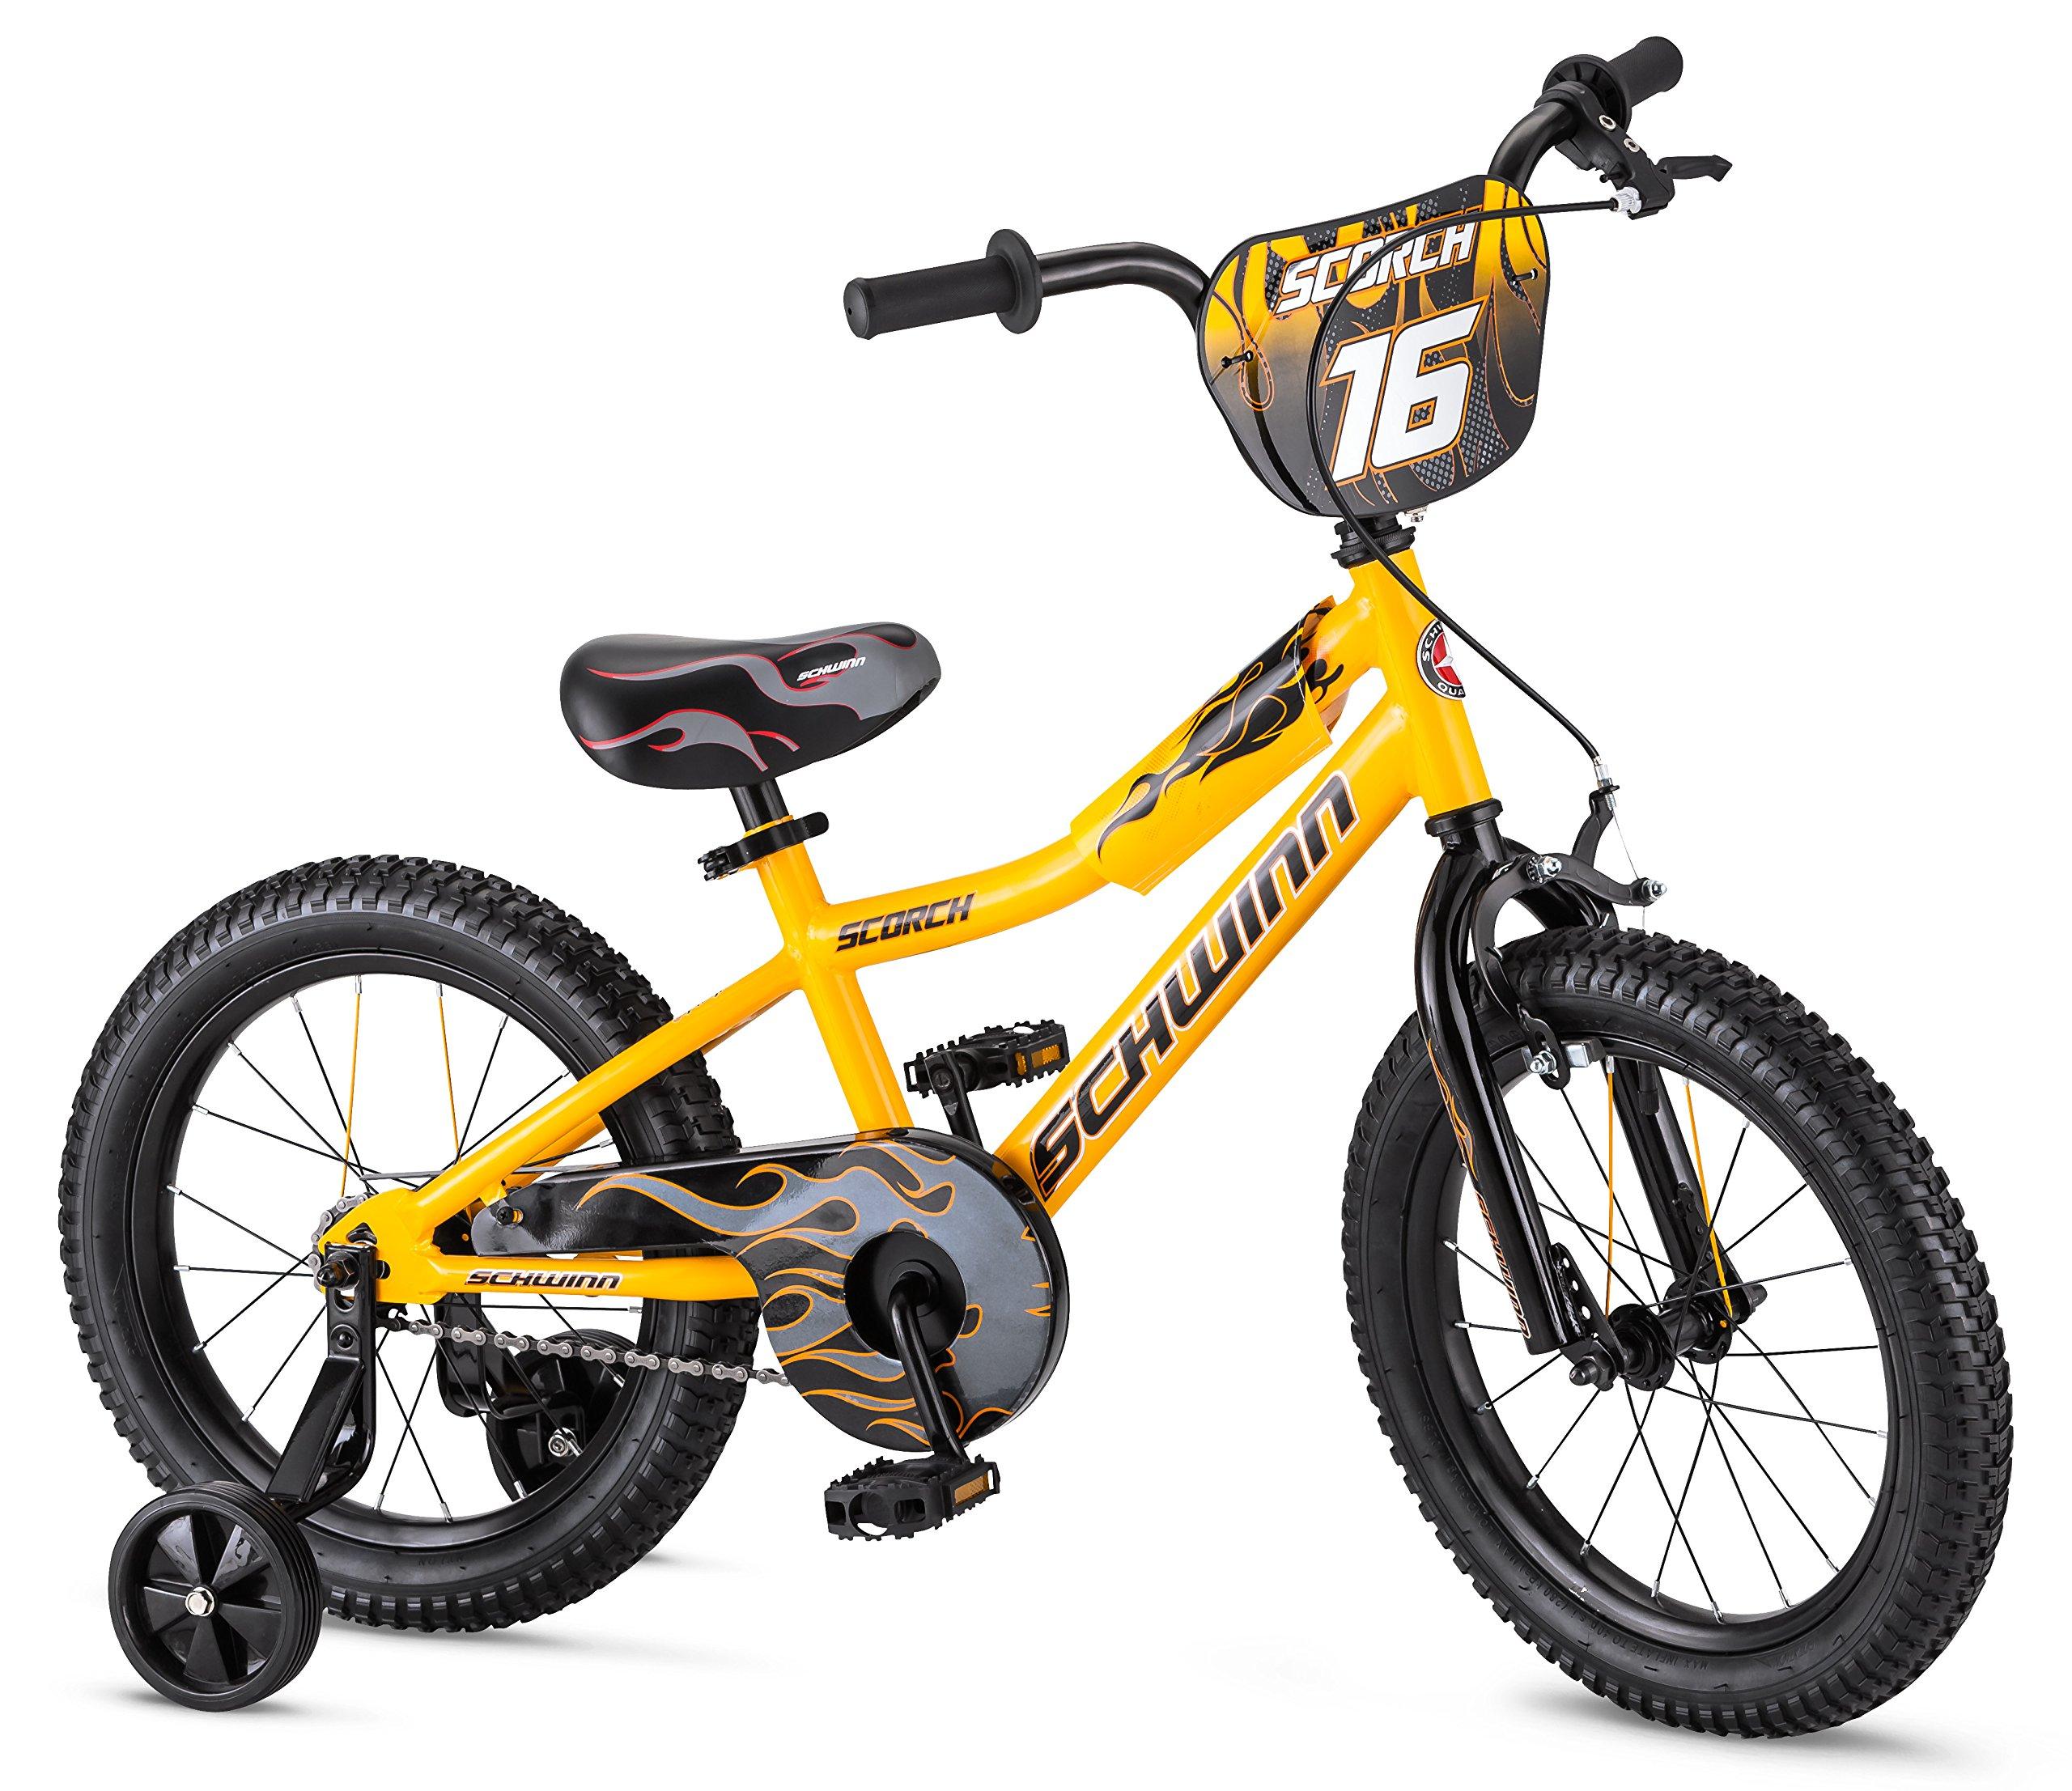 Schwinn Scorch Boy's Bicycle, 16'' Wheels, with Training Wheels by Schwinn